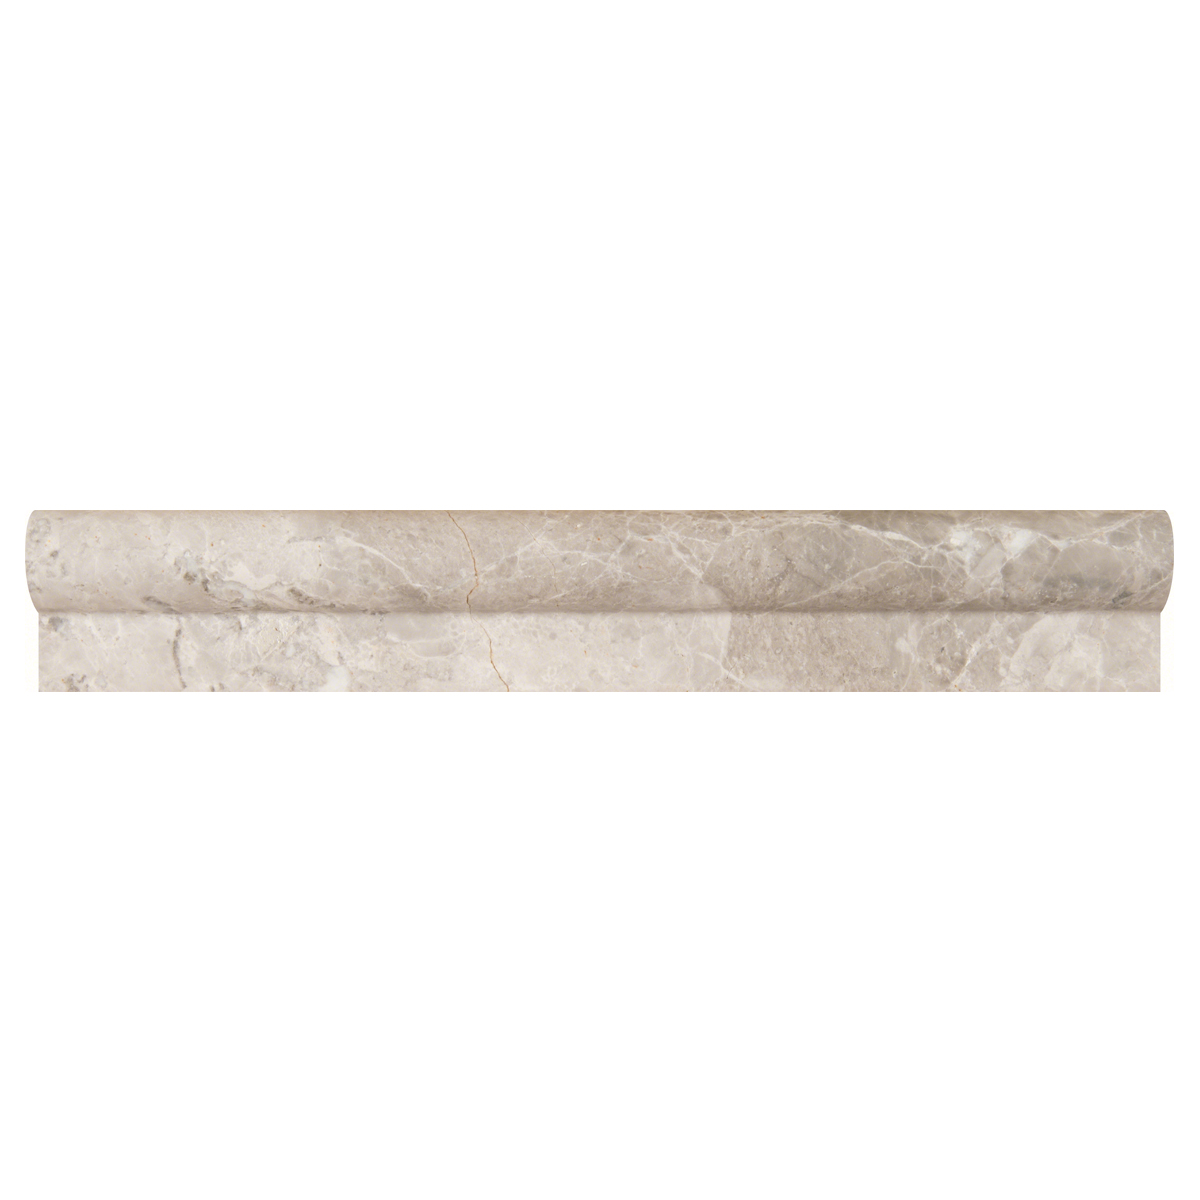 Tundra Gray 1x2x12 Rail Molding Polished